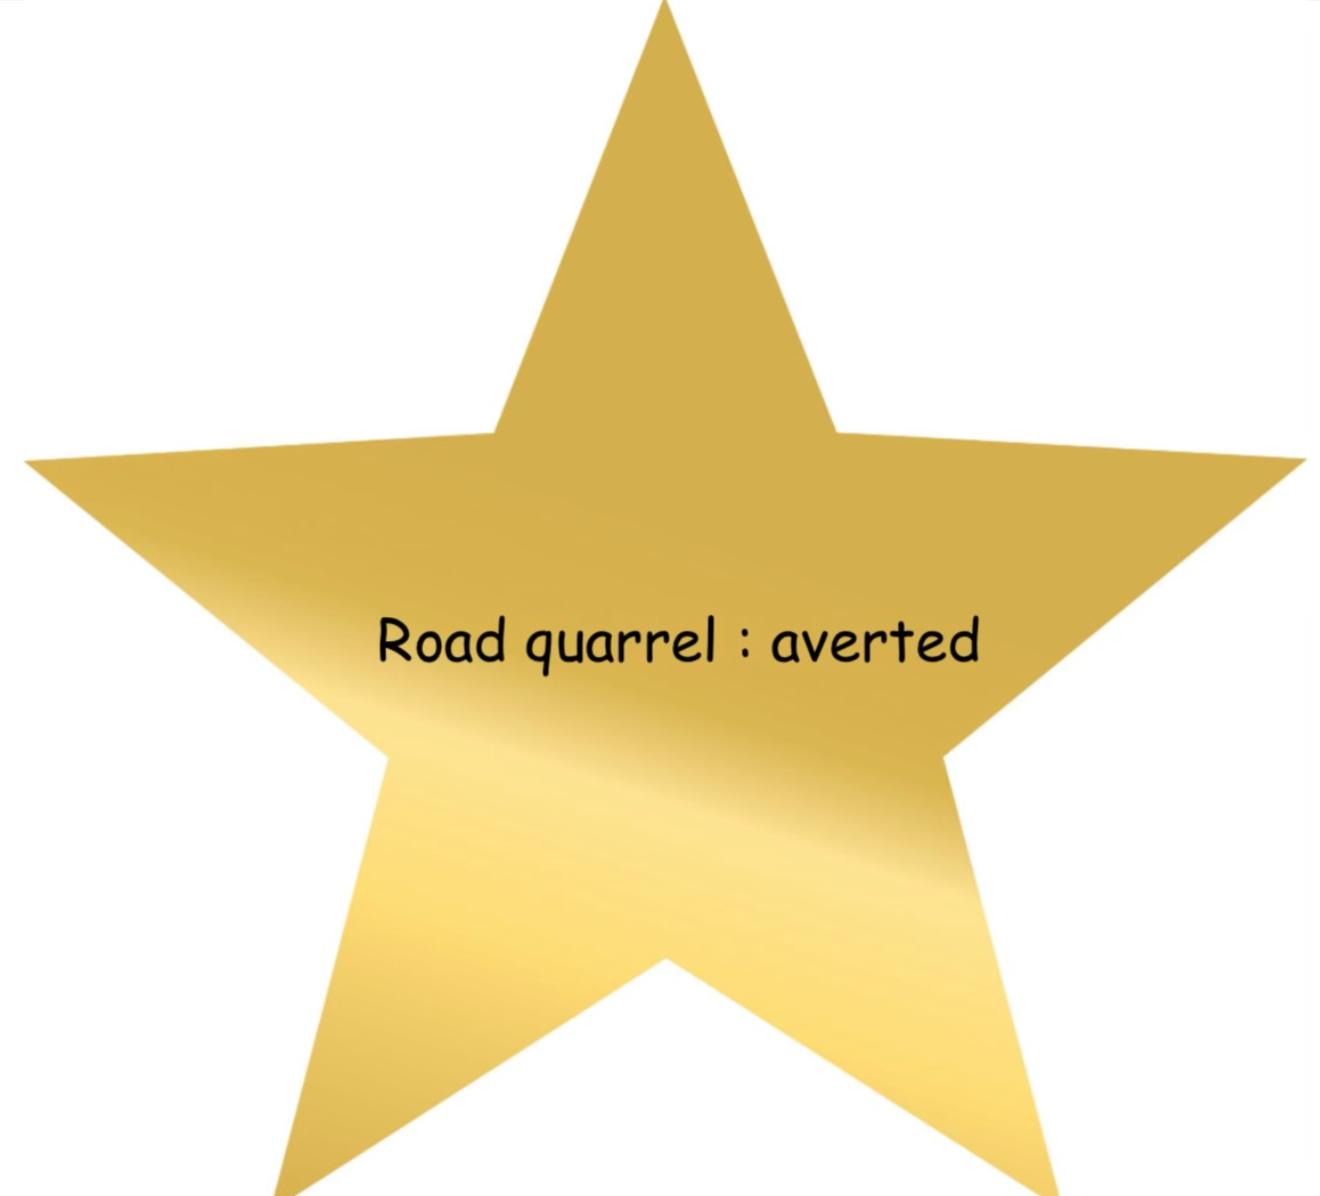 adulting award for averting a road quarrel